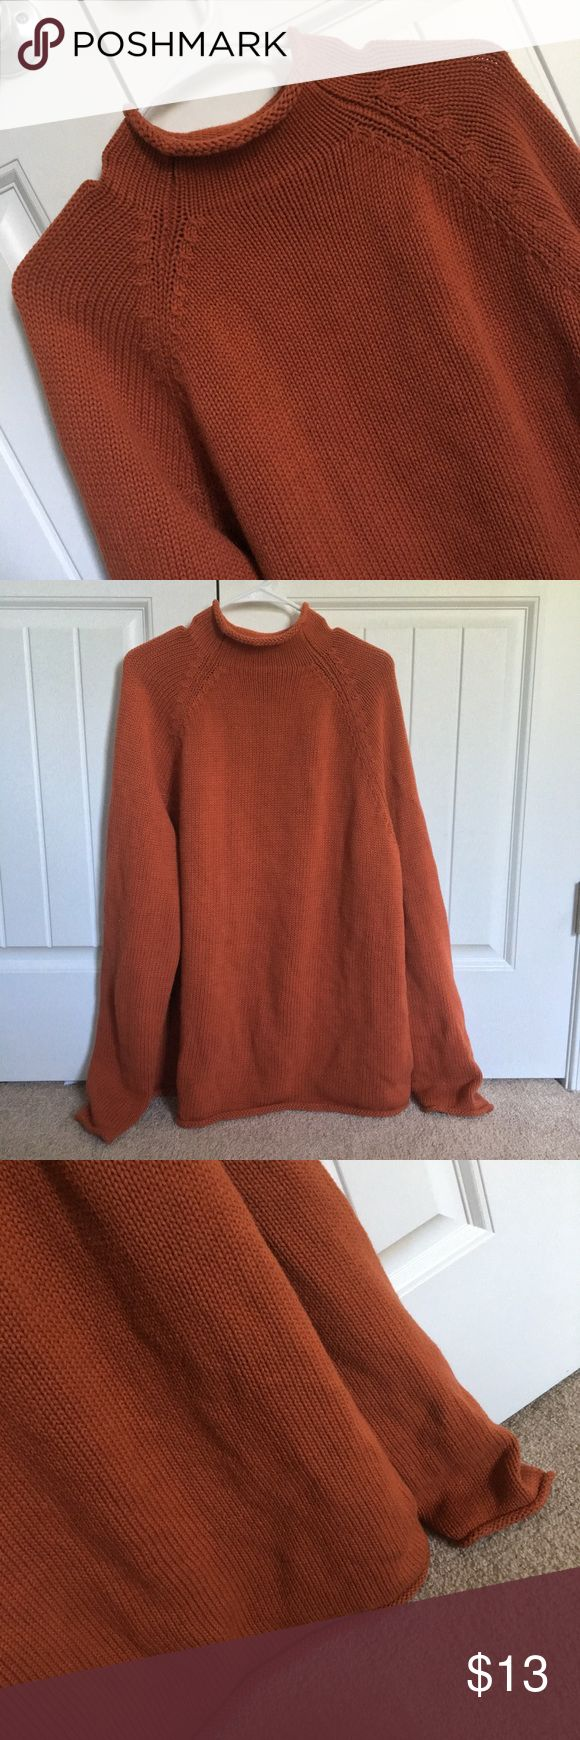 J. Crew Vintage Mens Sweater J. Crew Vintage Knit Mens Turtleneck sweater in a rust orange color. perfect condition! Size XL. 100% Cotton. ✨ J. Crew Sweaters Turtleneck